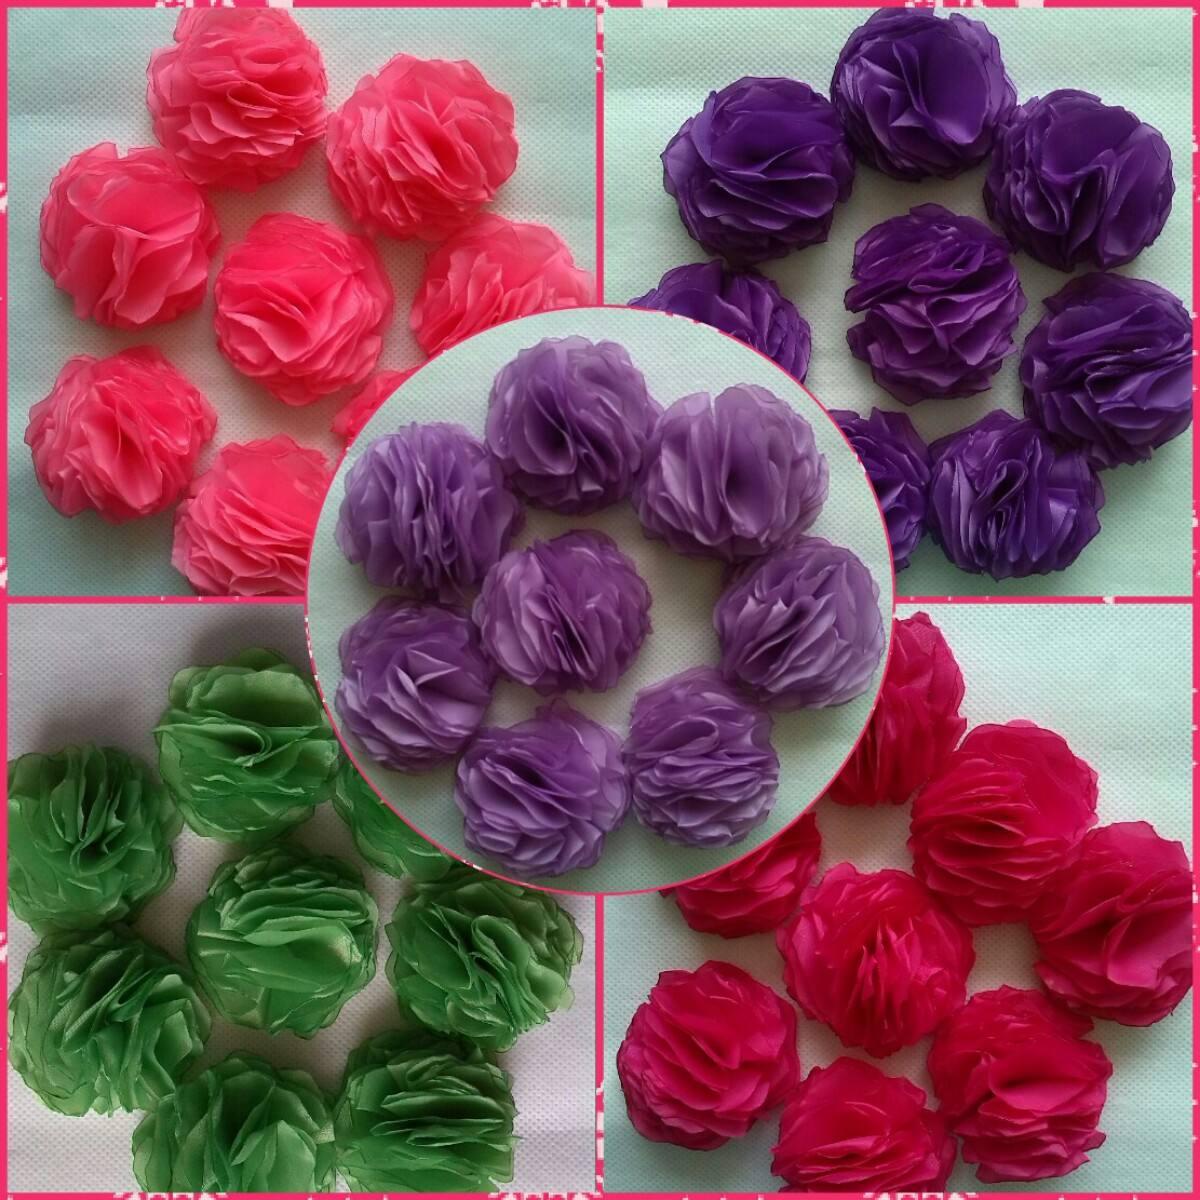 Flores de tela al estilo rosas cintillos coronas de flores bs 800 00 en mercado libre - Flores de telas hechas a mano ...